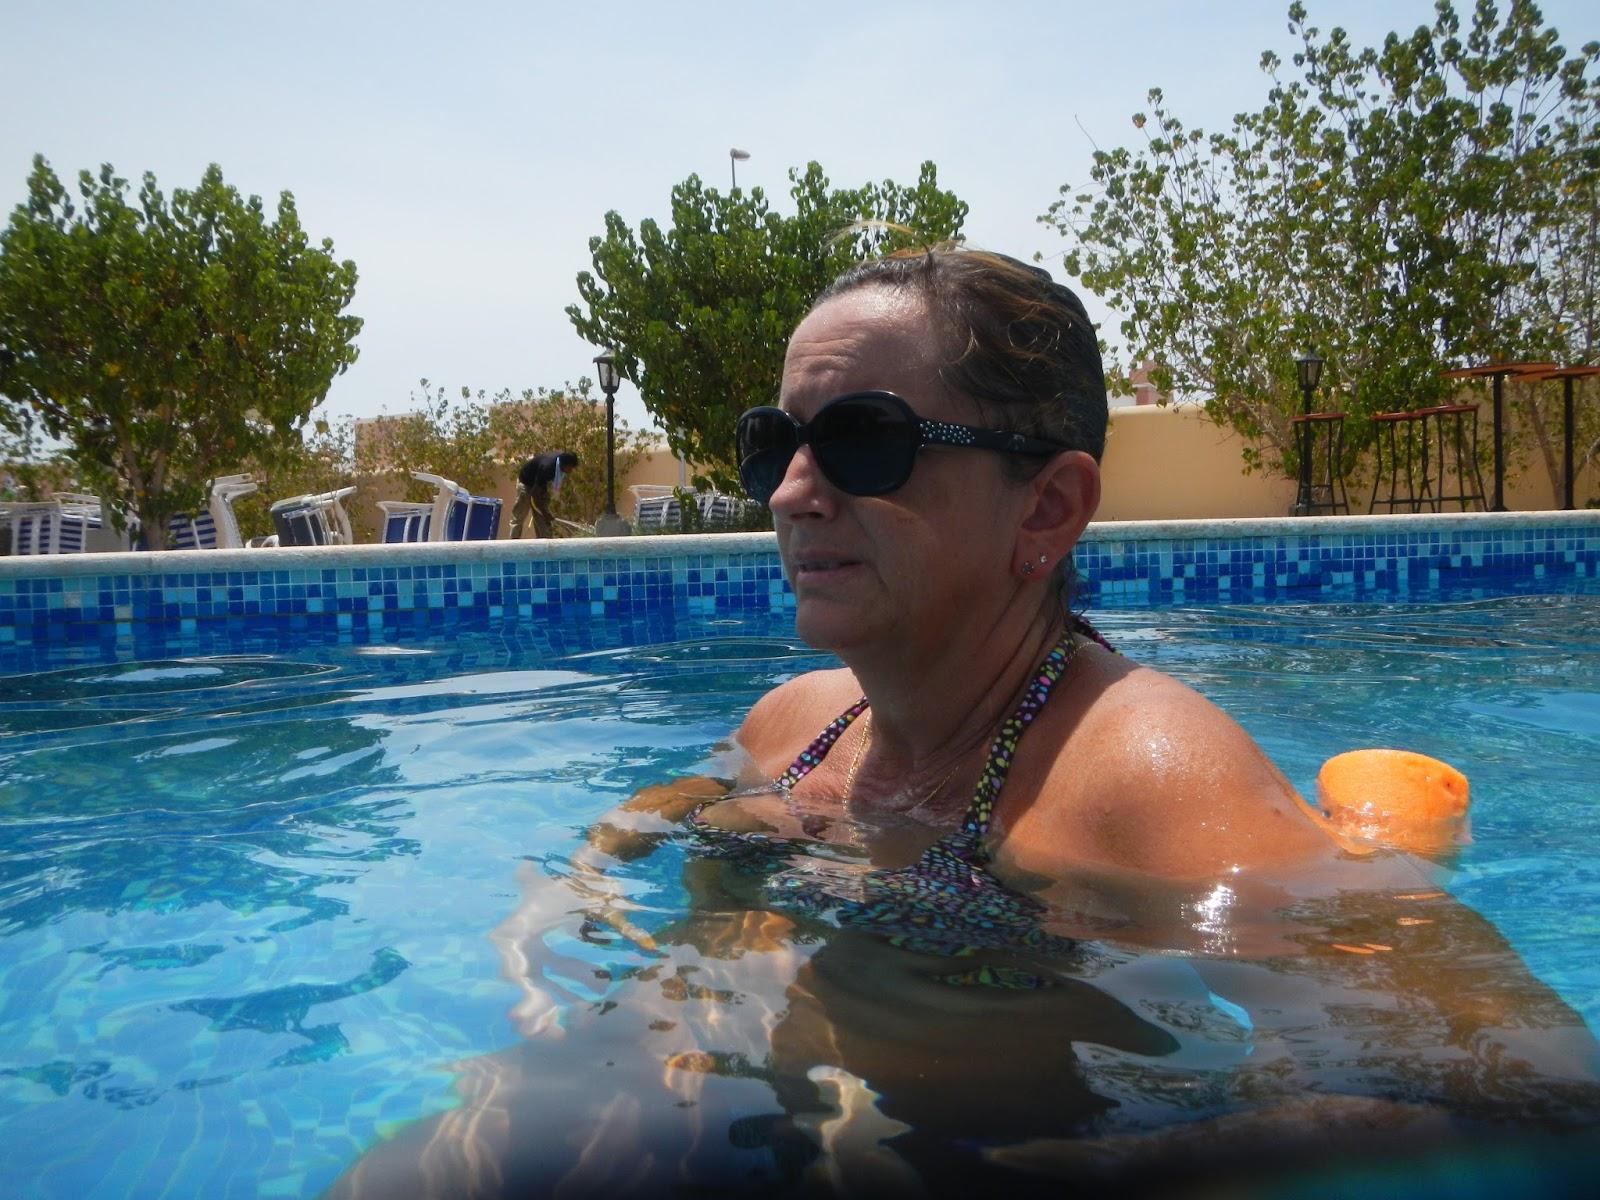 Les gife djibouti une derniere journ e deux la for Journee piscine